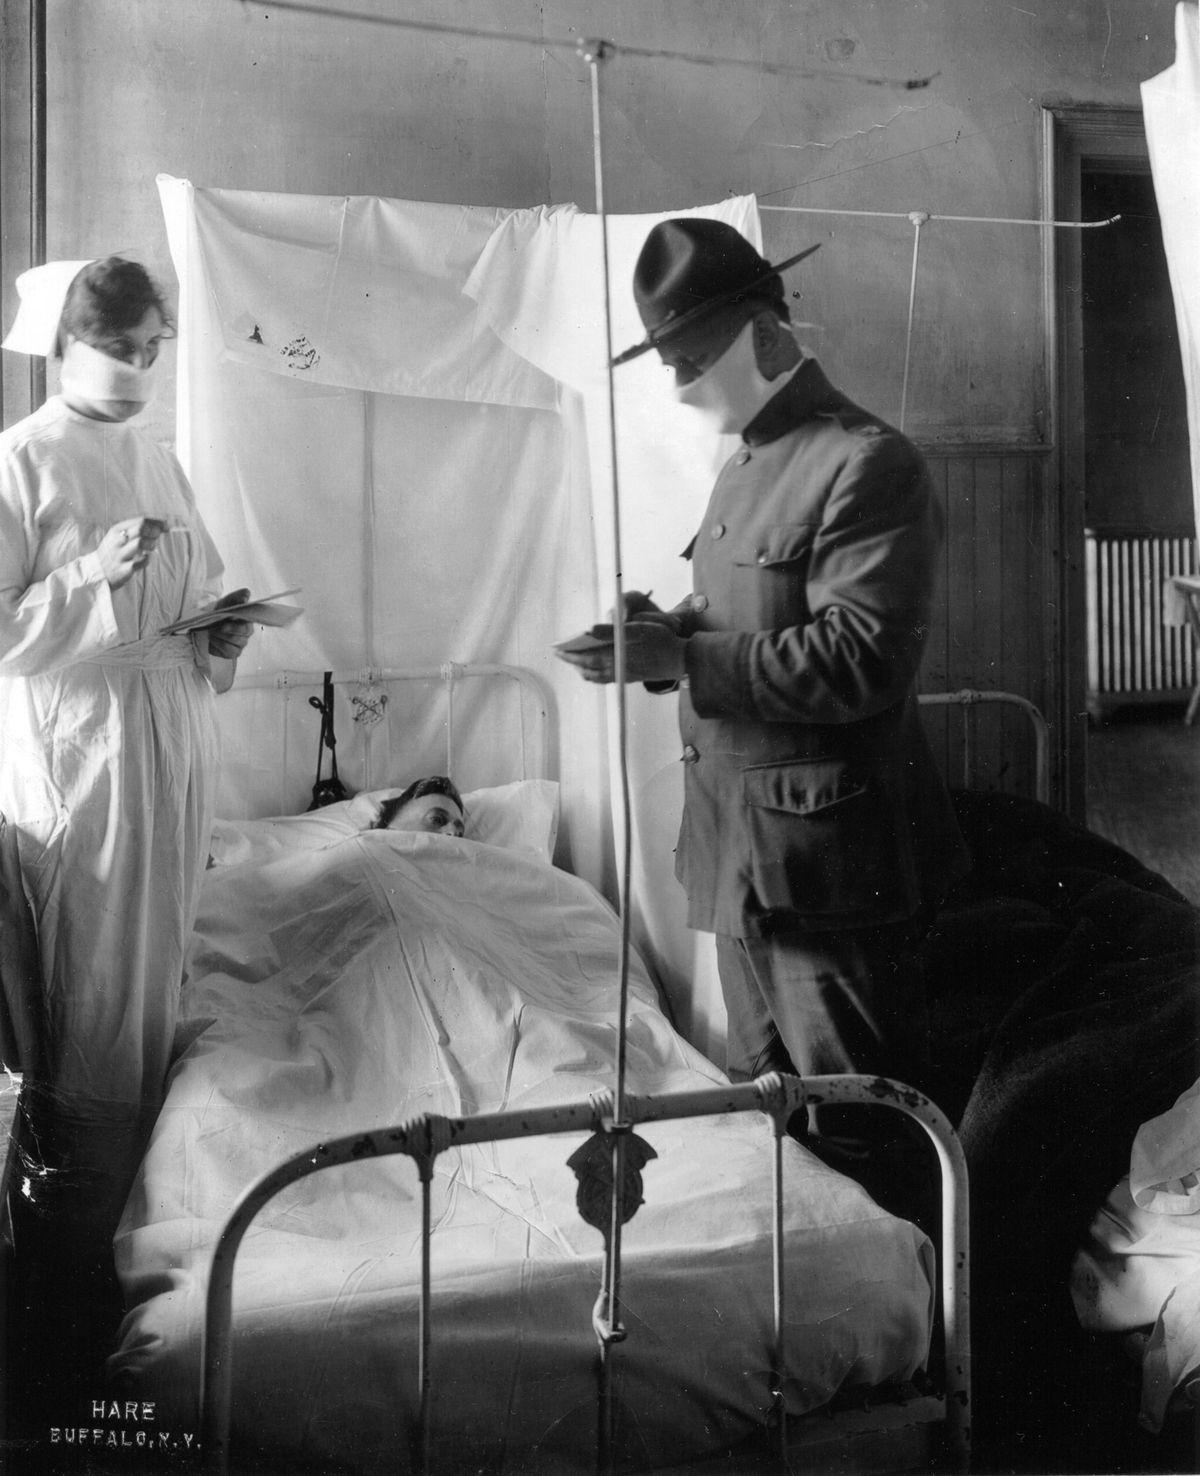 Flu Epidemic - Hospital